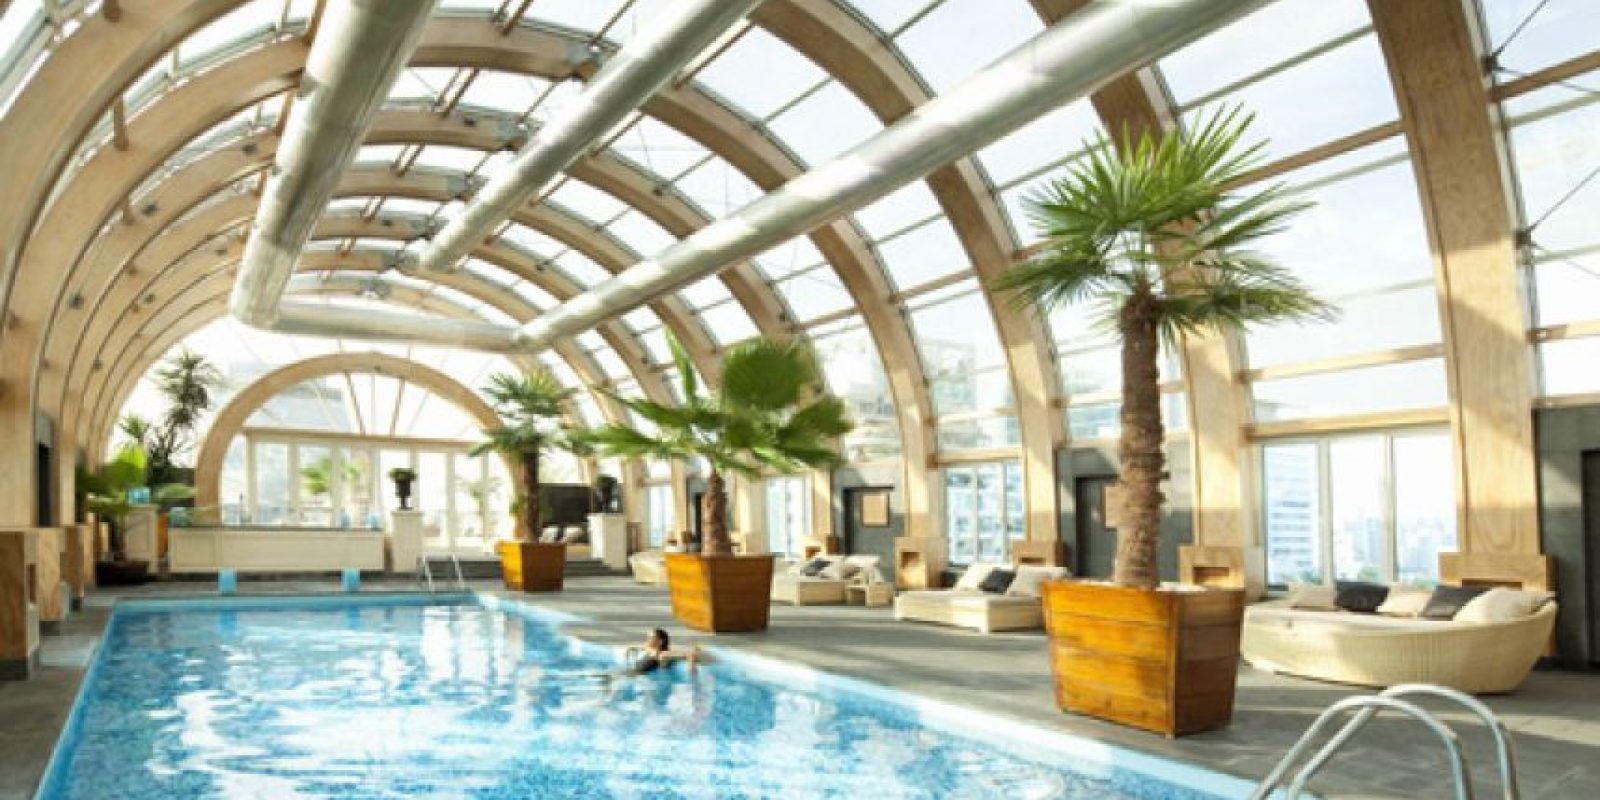 Foto:Hotel Ritz-Carlton